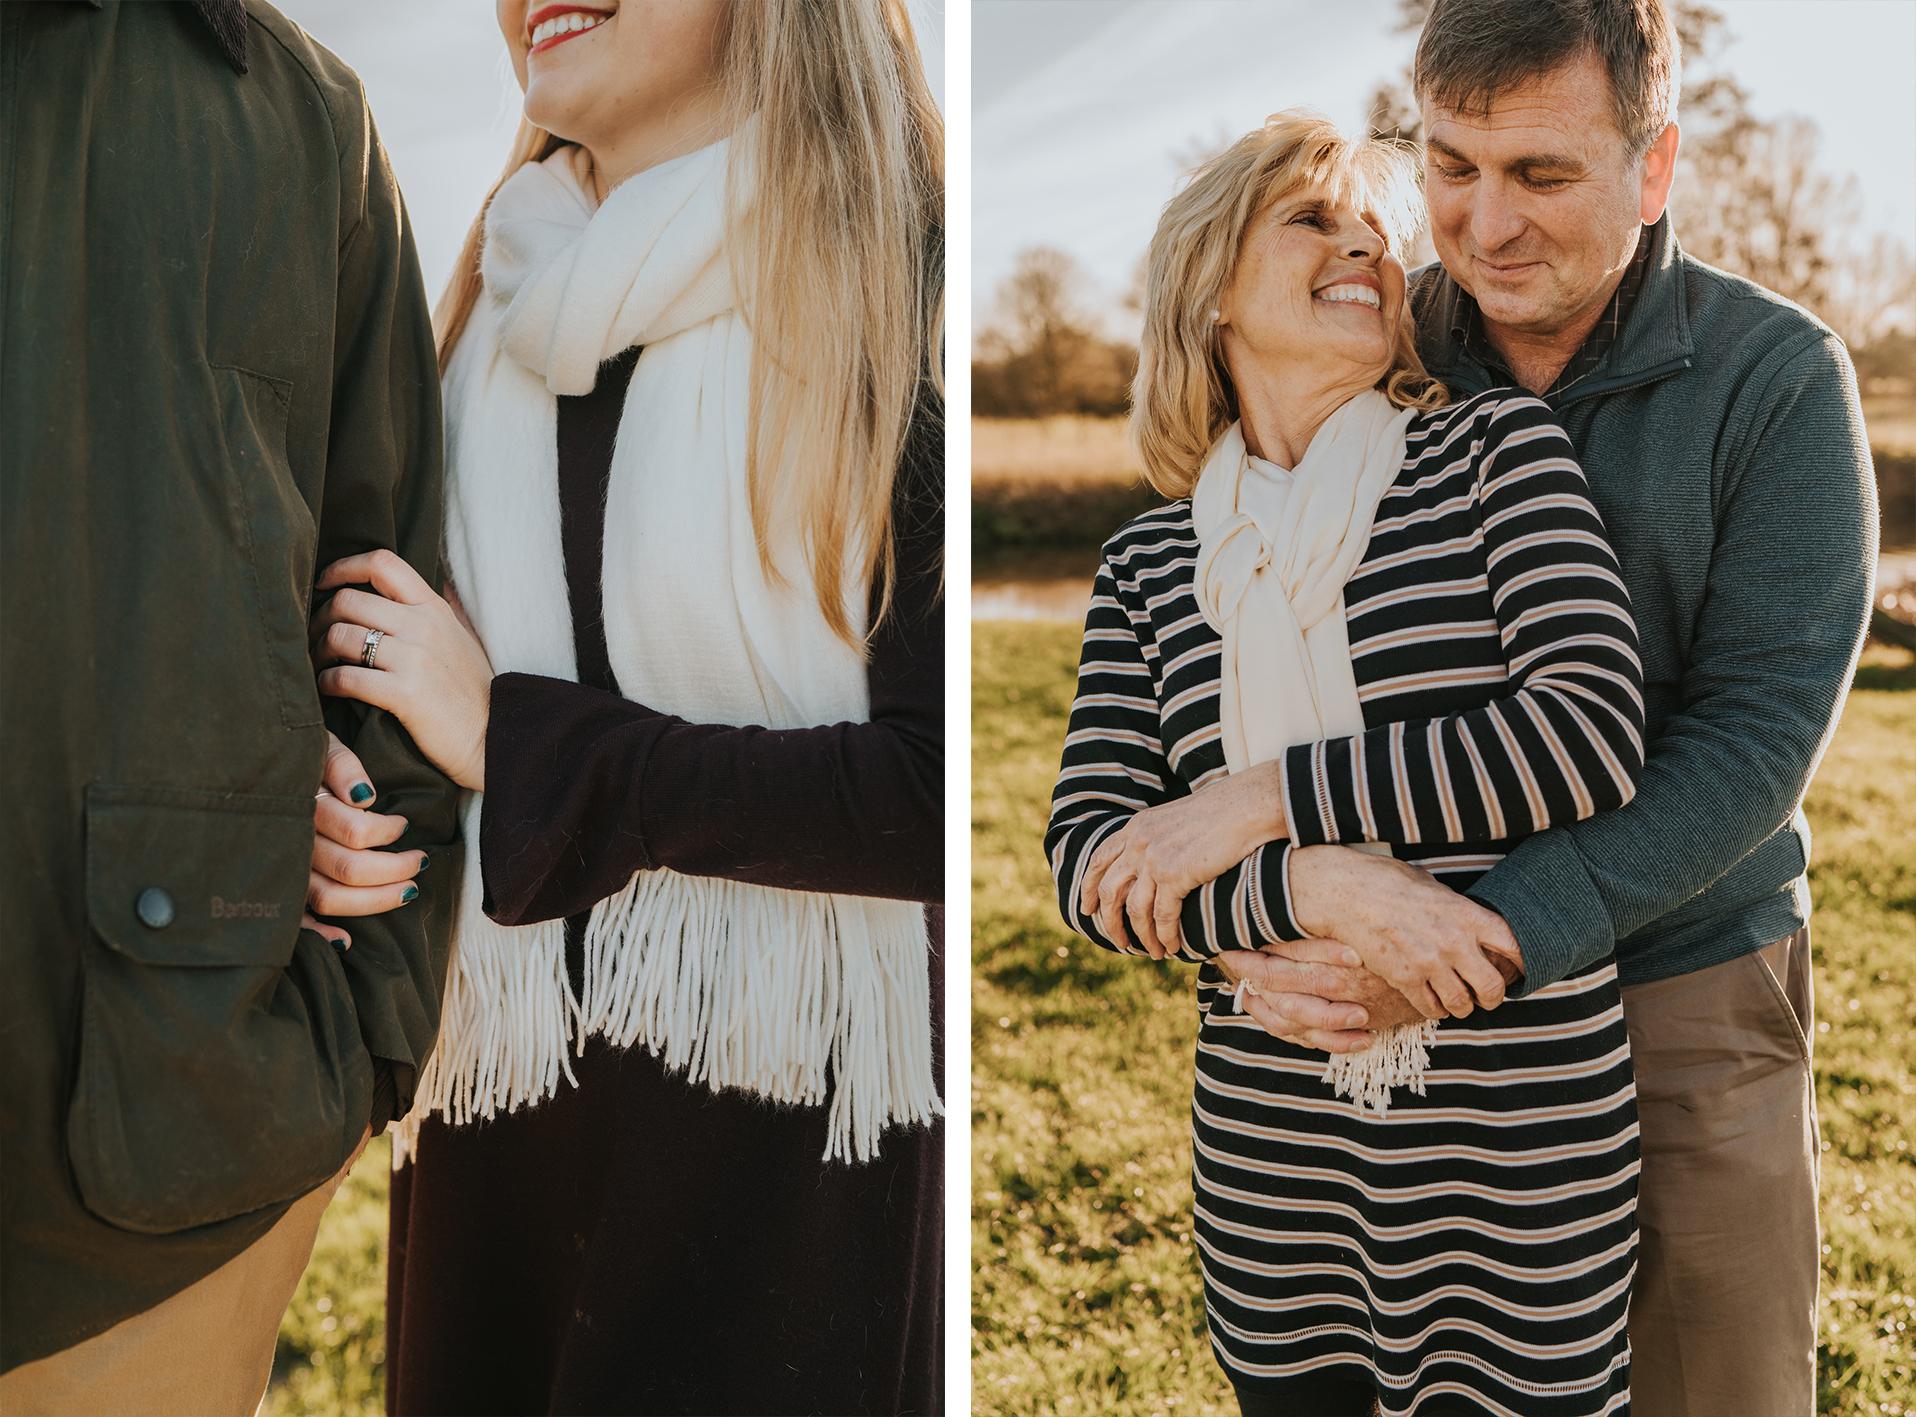 what-to-wear-to-your-engagement-session-pre-wedding-session-grace-elizabeth-colchester-essex-alternative-wedding-lifestyle-photographer-norfolk-suffolk-devon-10.jpg